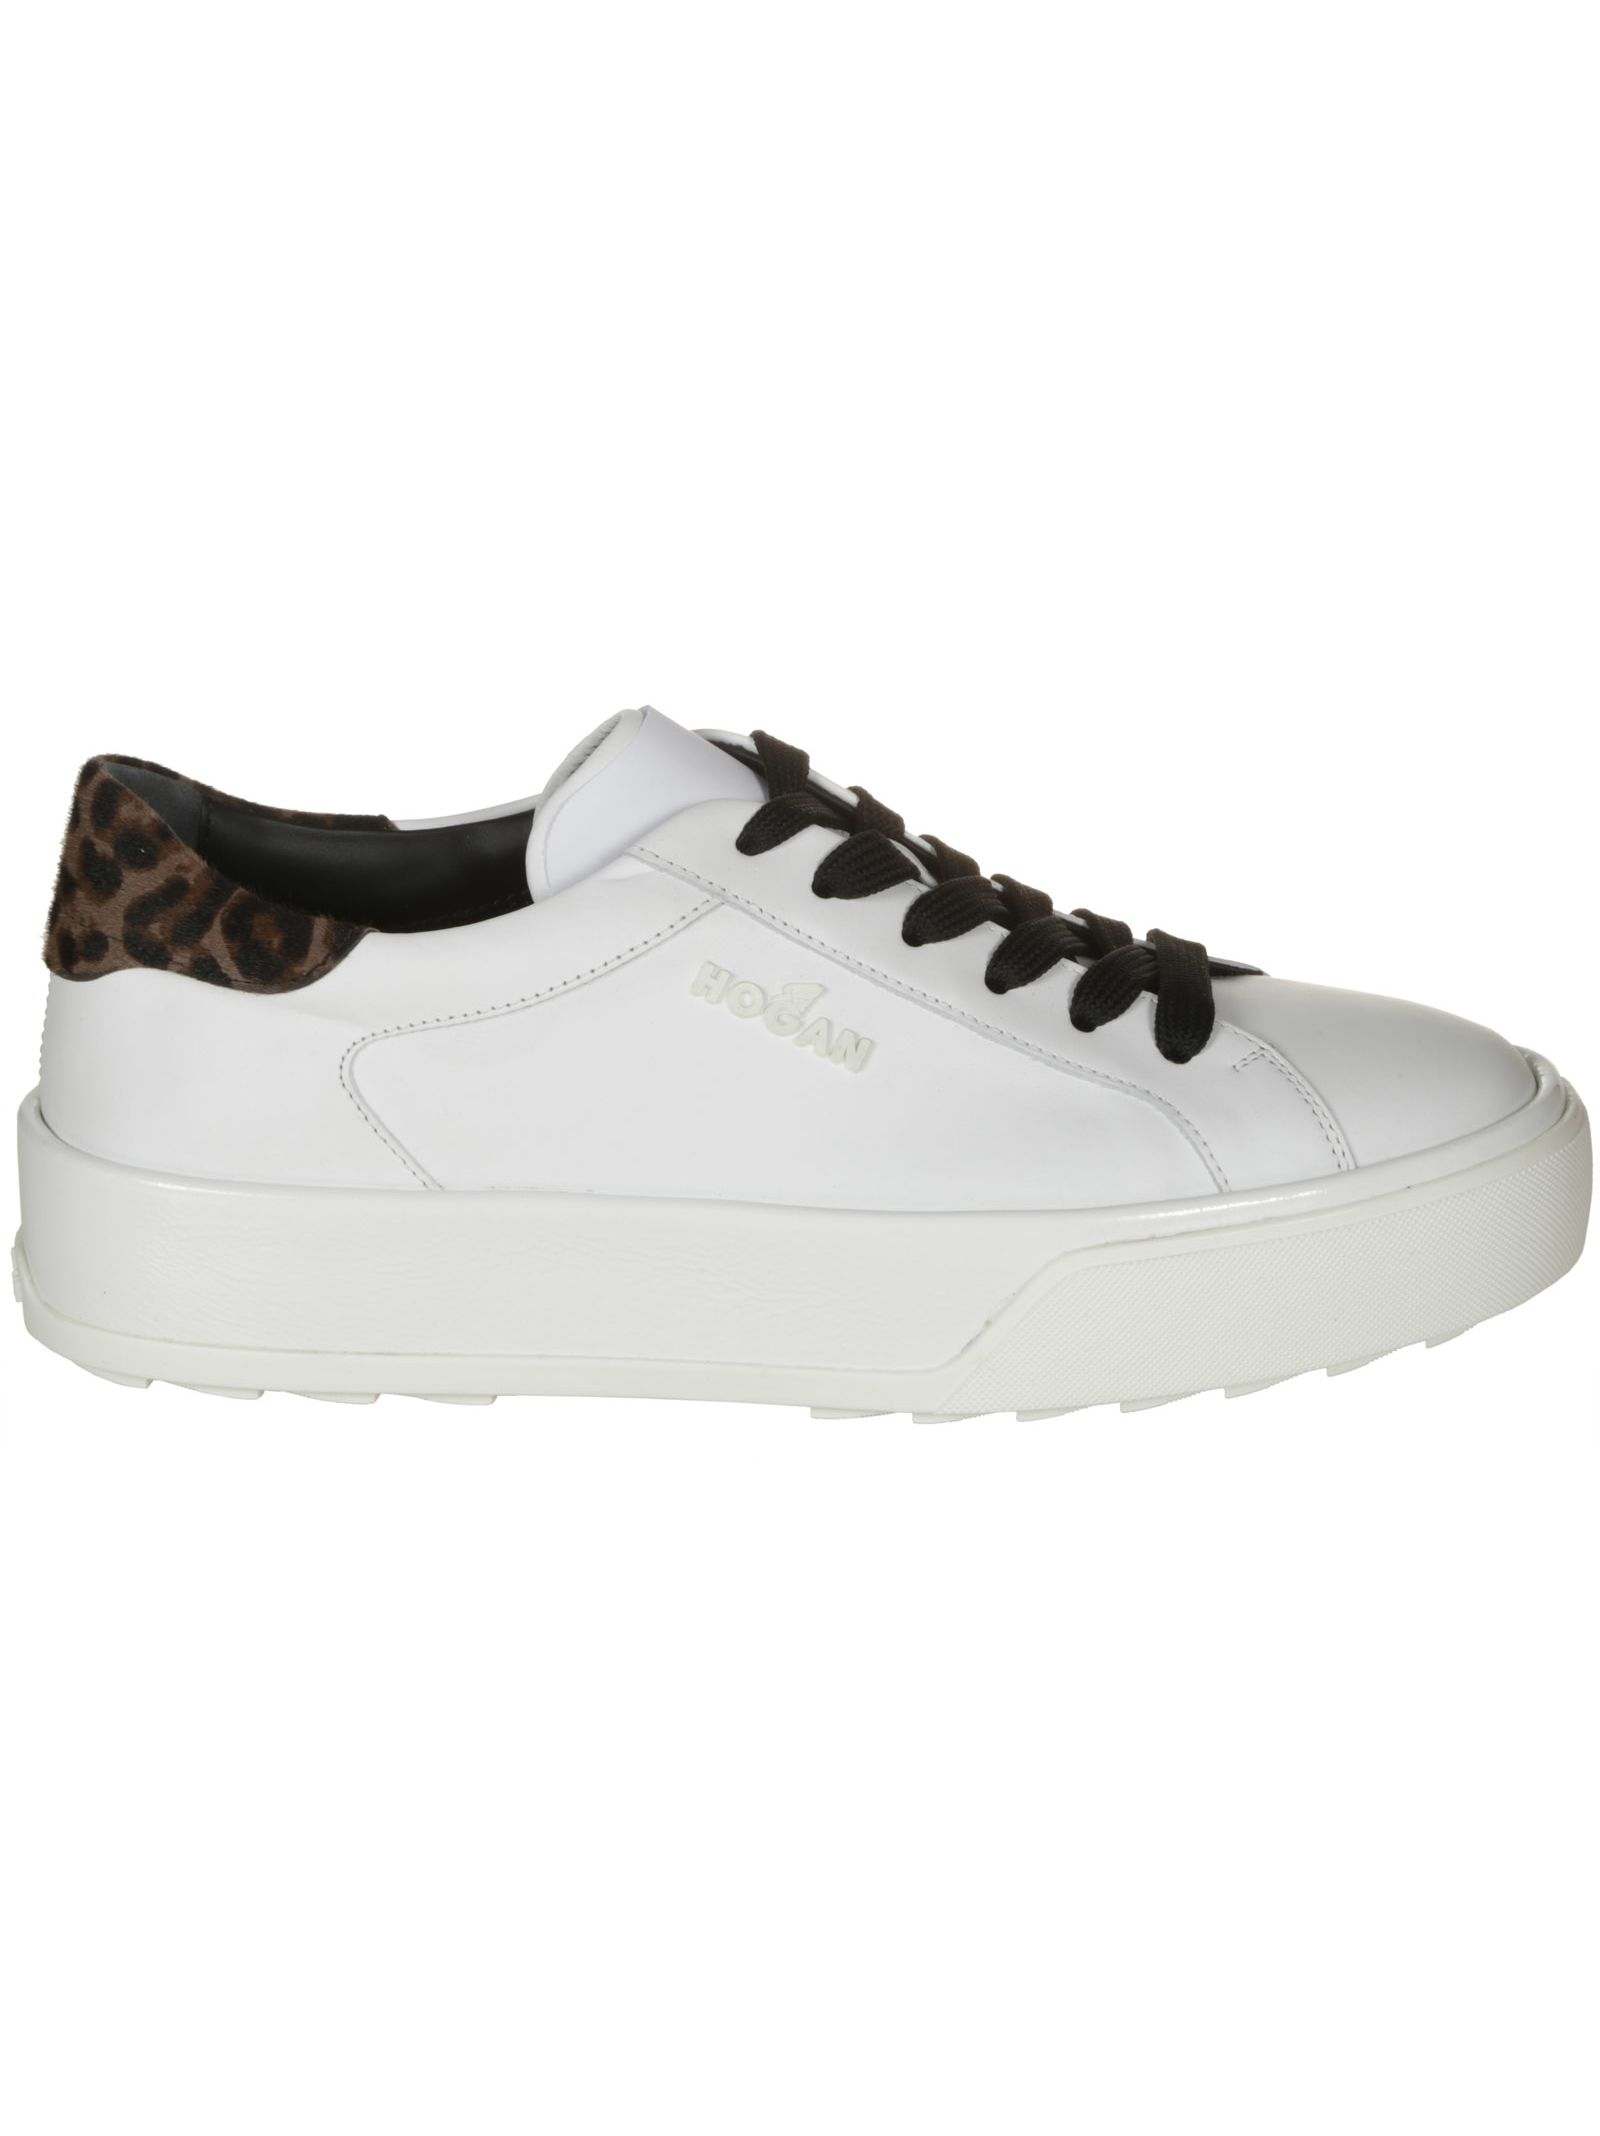 HOGAN Leopard Print Detail Sneakers in White